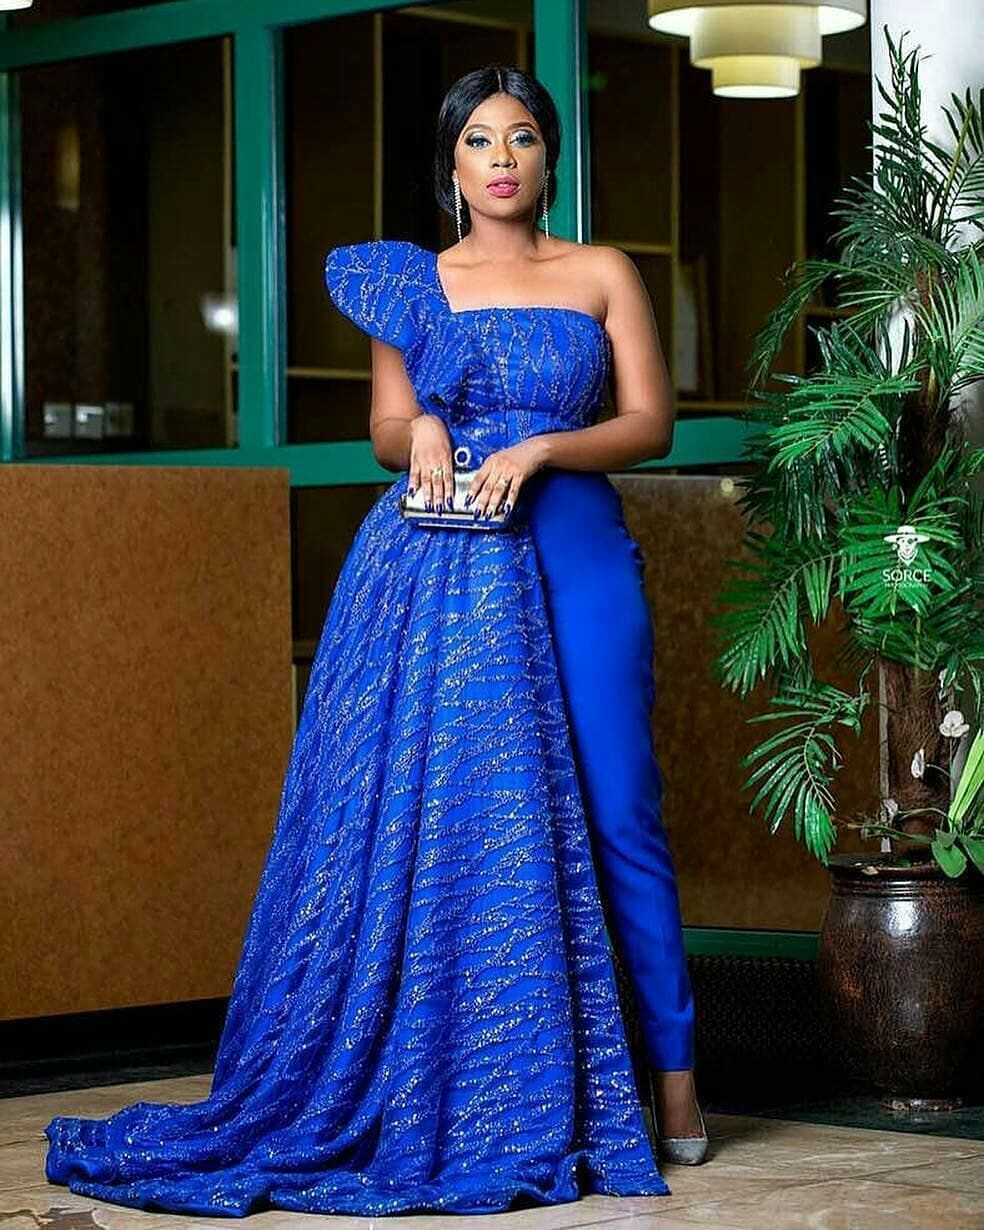 After Reception Dresses,Blue Wedding Reception Dress,best bridal reception dresses,after wedding dress,reception gown,